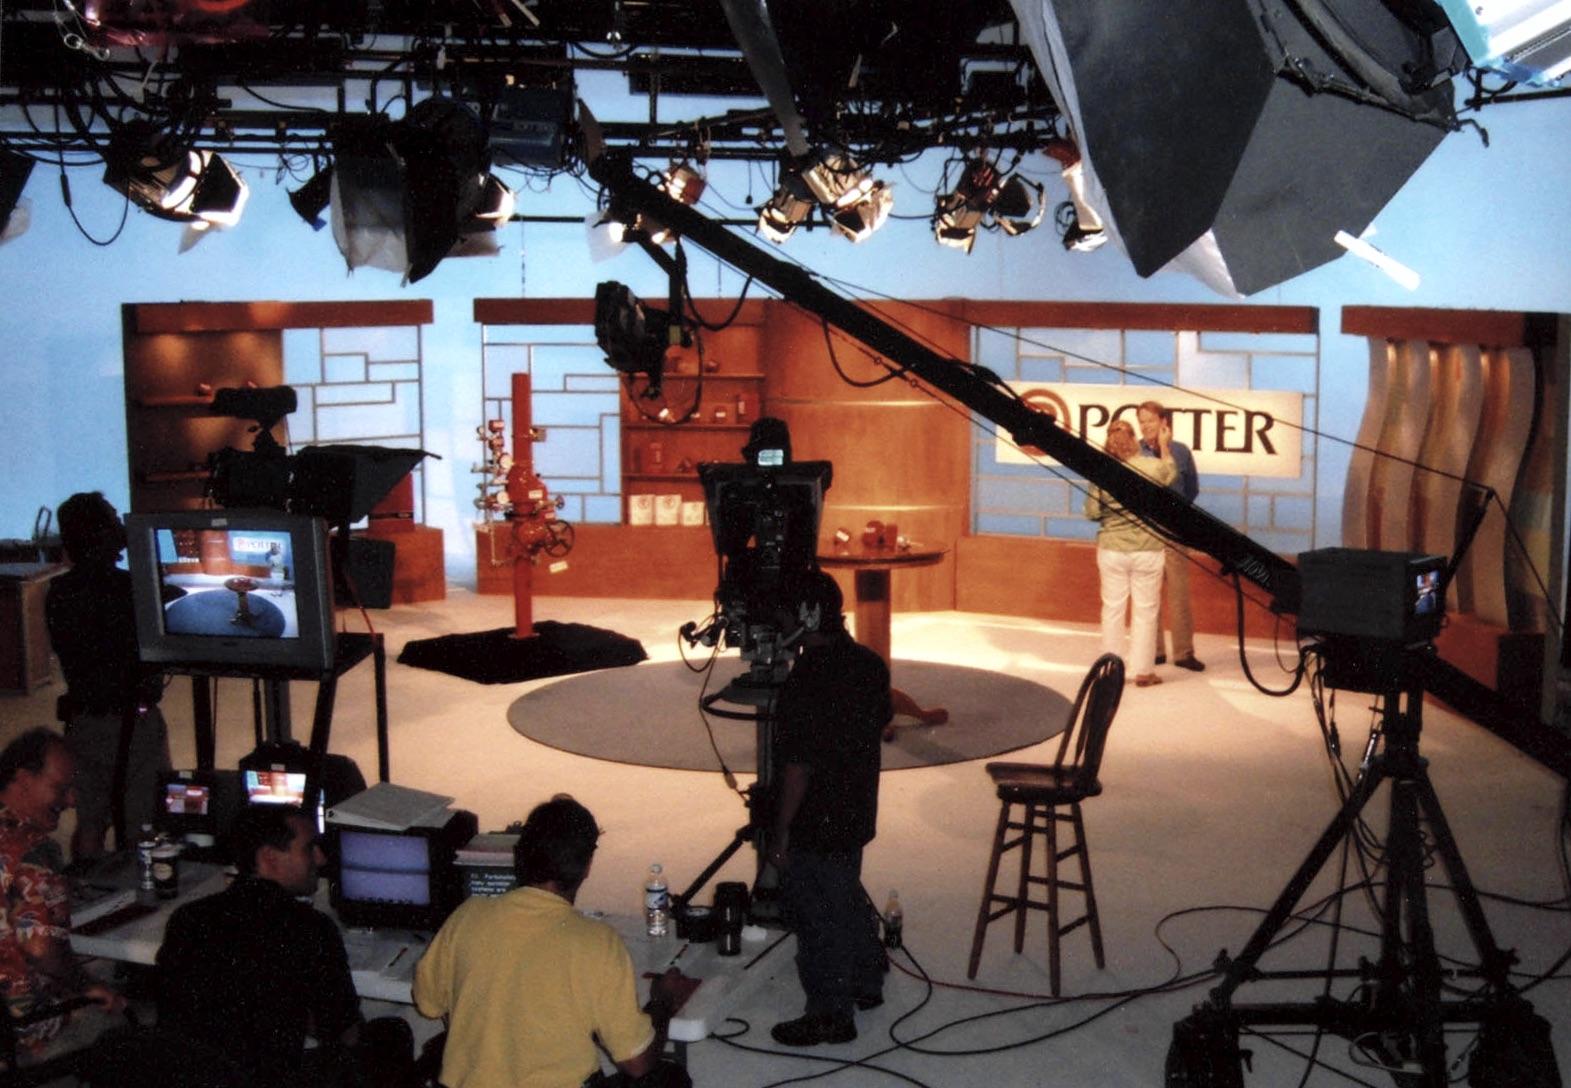 Potter video studio shoot